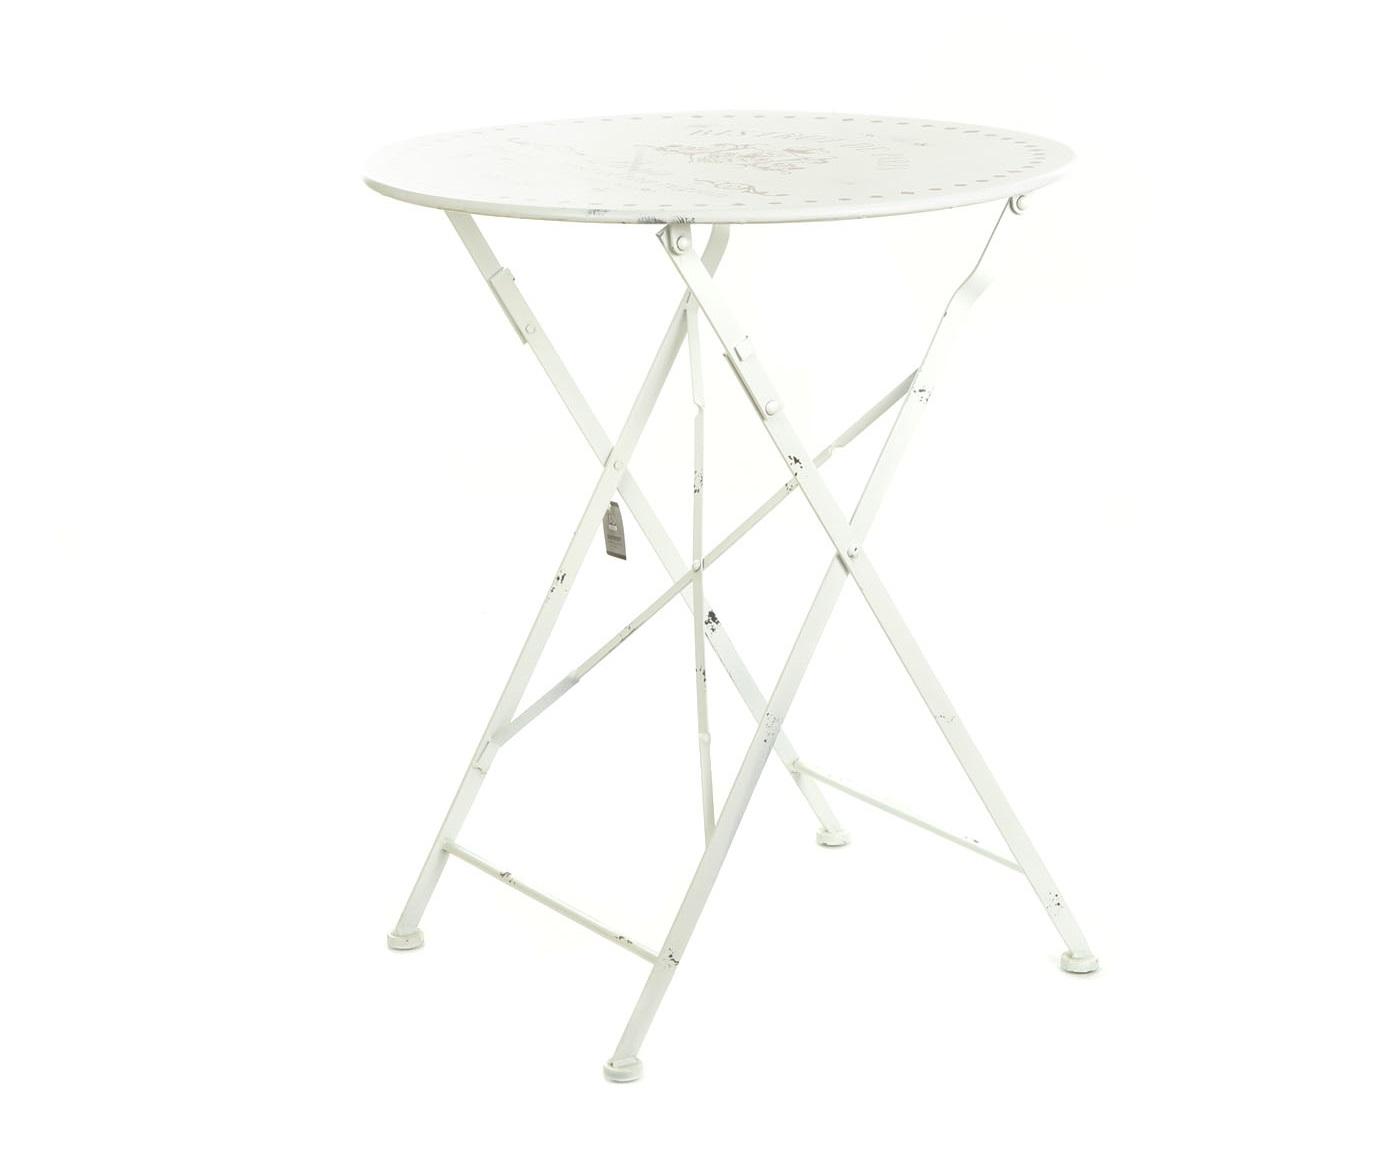 СтоликСтолы и столики для сада<br><br><br>Material: Металл<br>Length см: None<br>Width см: 45<br>Depth см: 45<br>Height см: 75